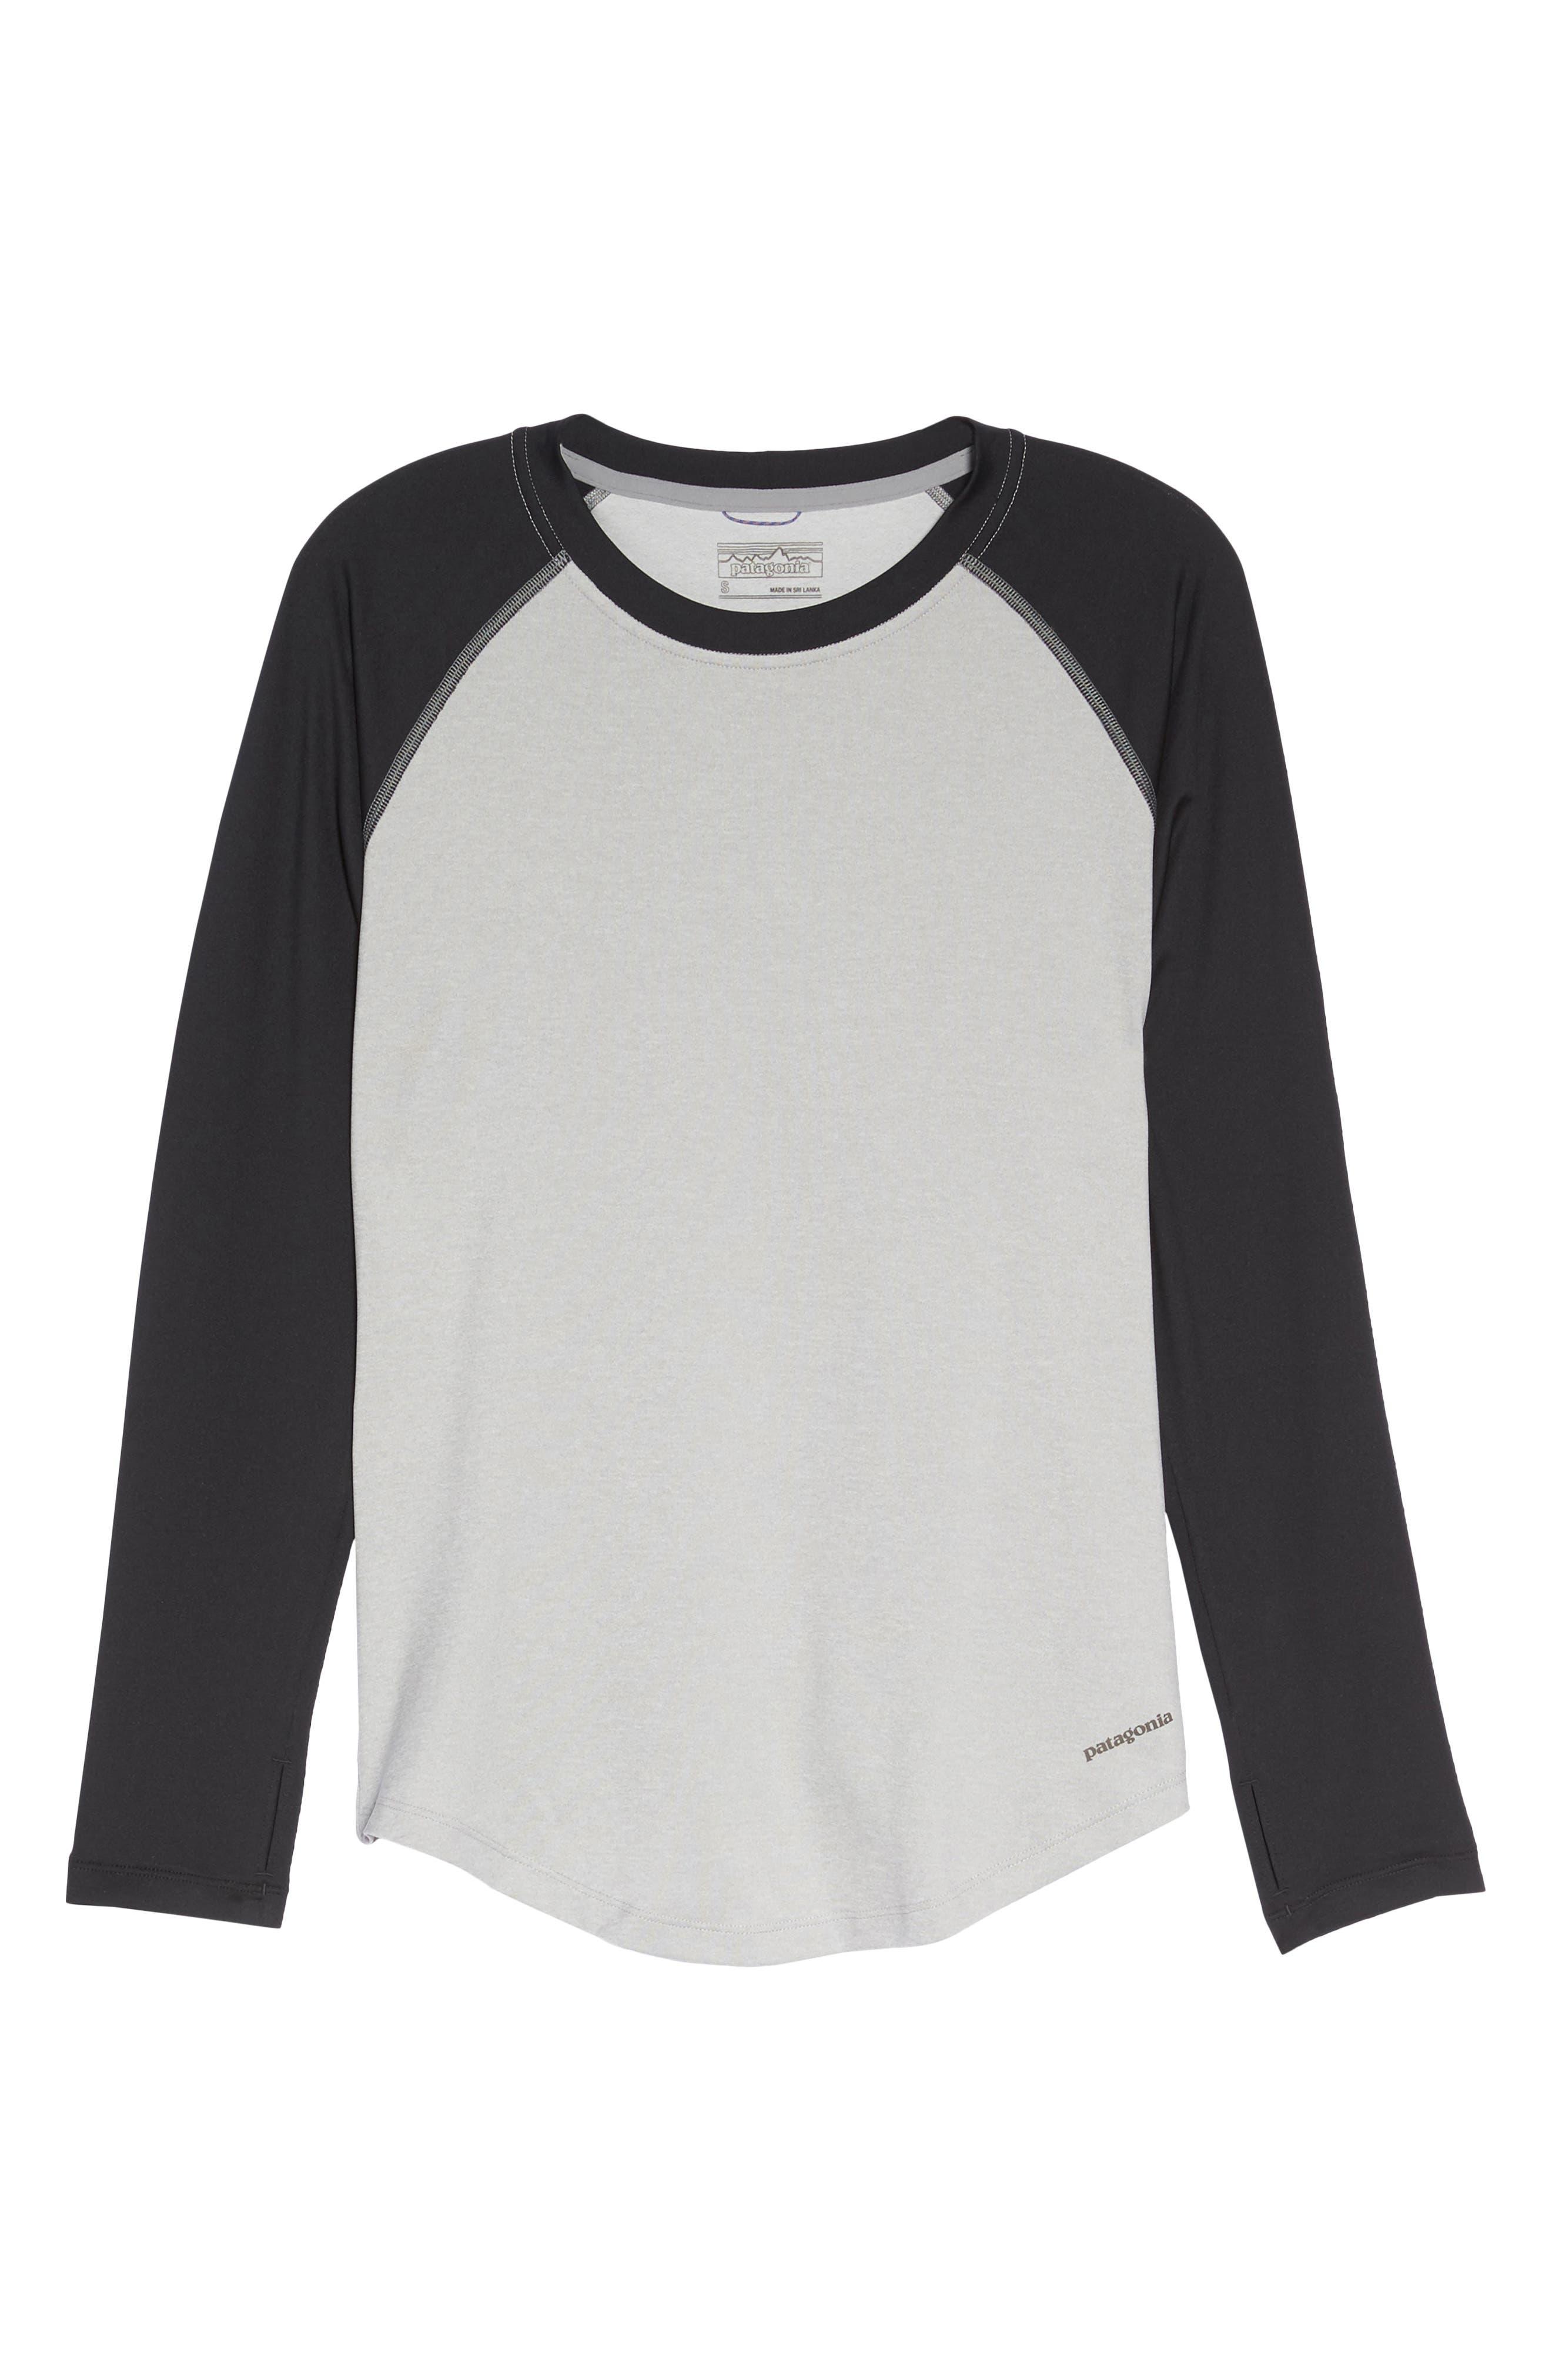 Tropic Comfort Shirt,                             Alternate thumbnail 7, color,                             021